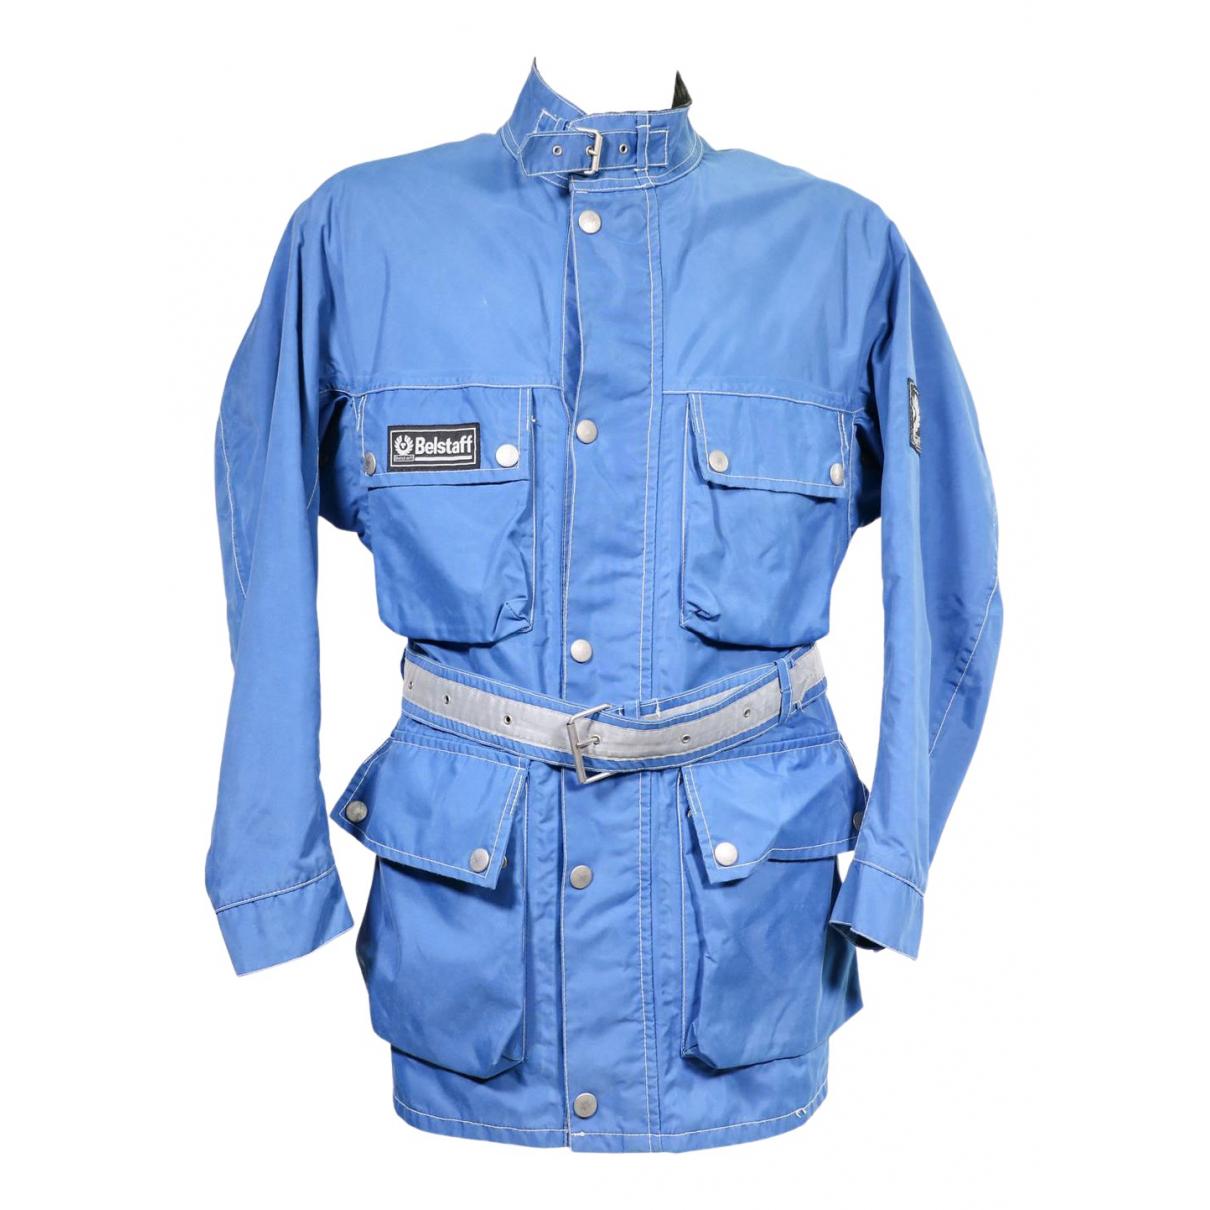 Belstaff \N Jacke in  Blau Baumwolle